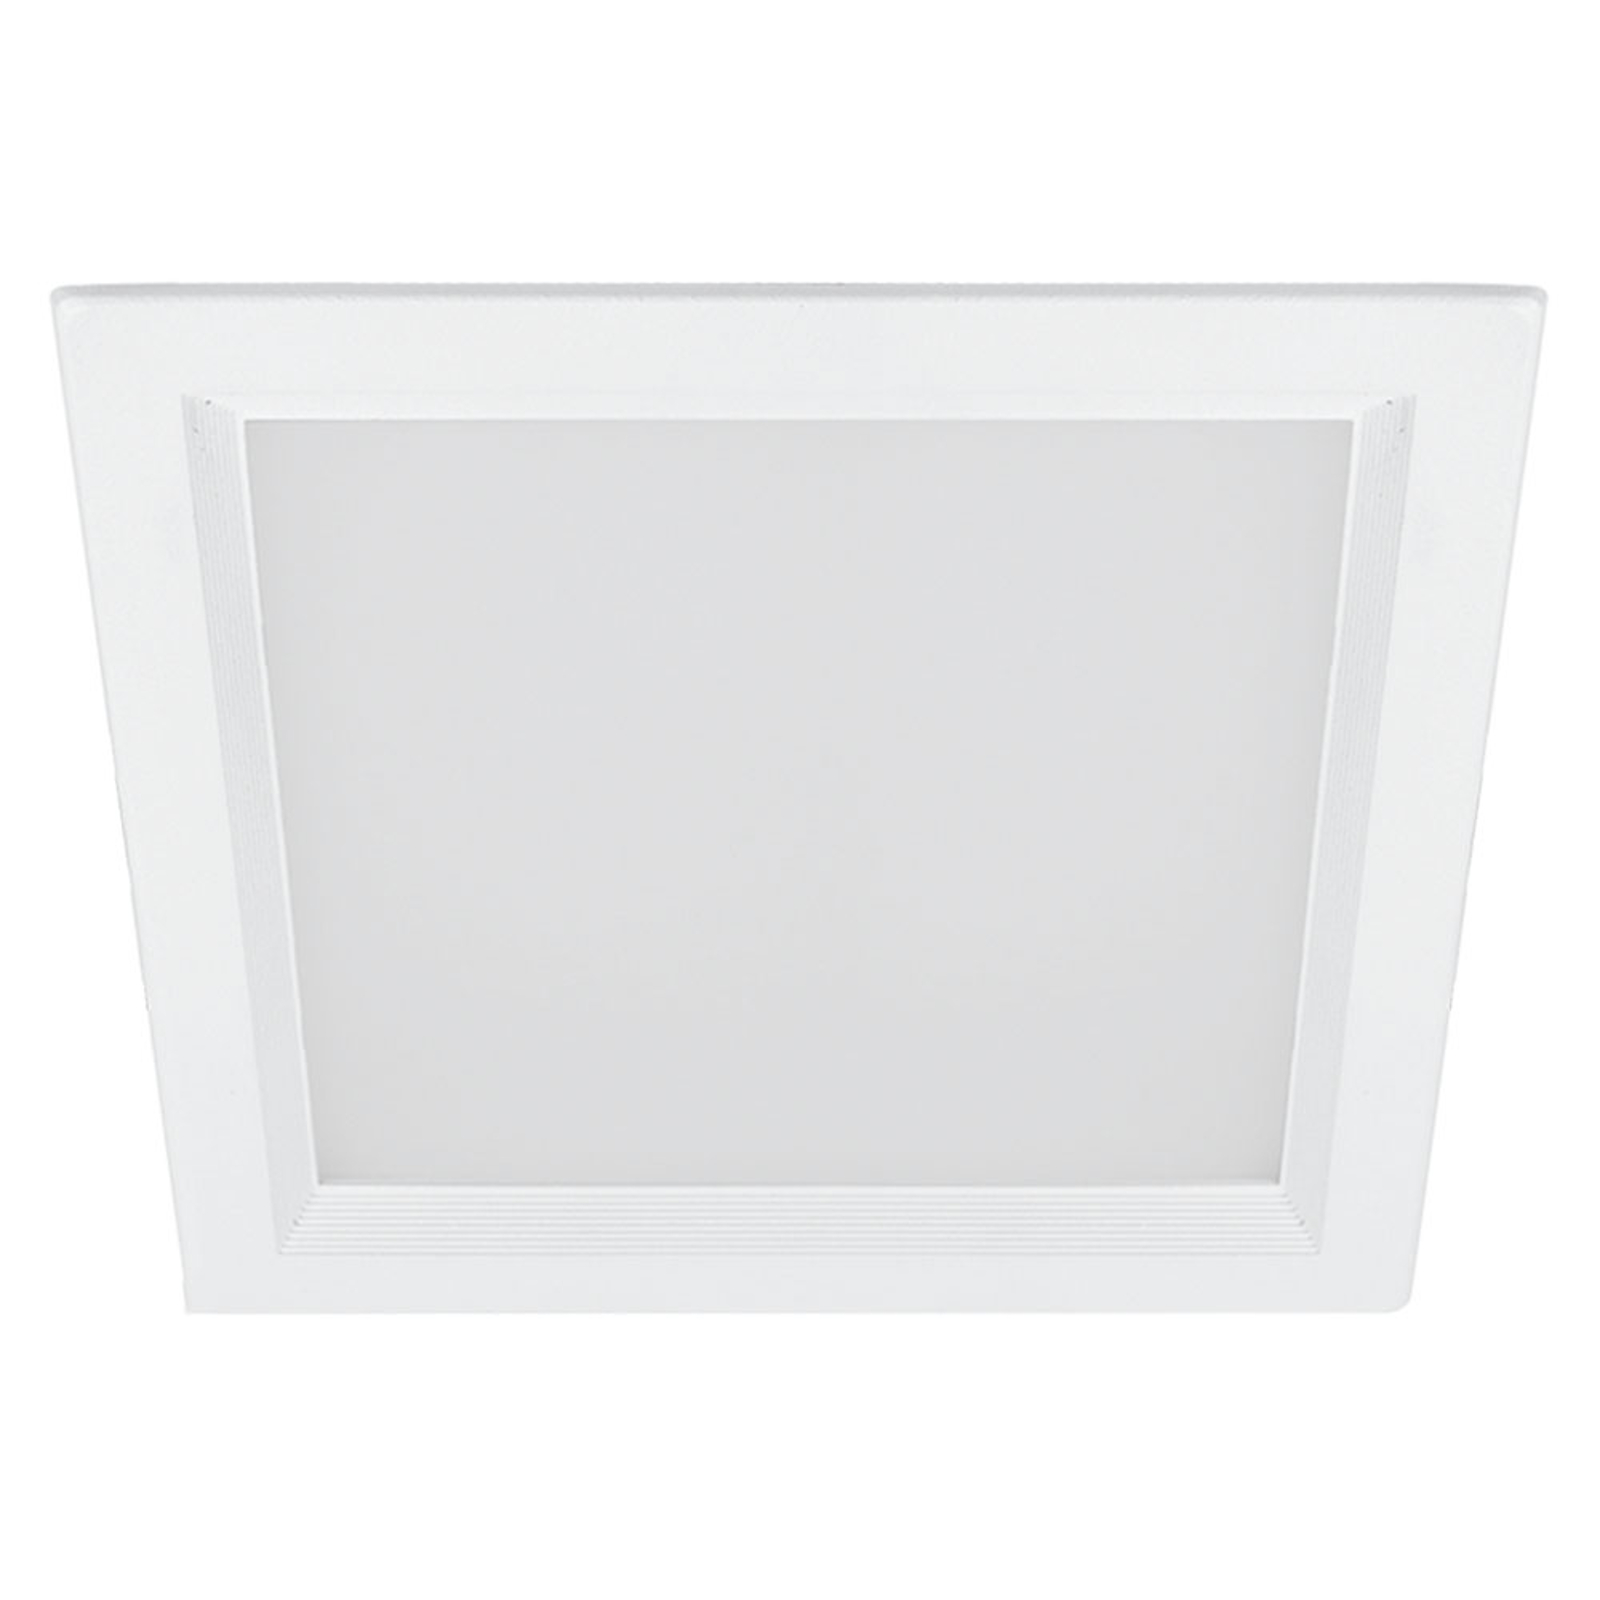 LED-Einbauleuchte scota-SDES-O/220 4.000K 22x22cm